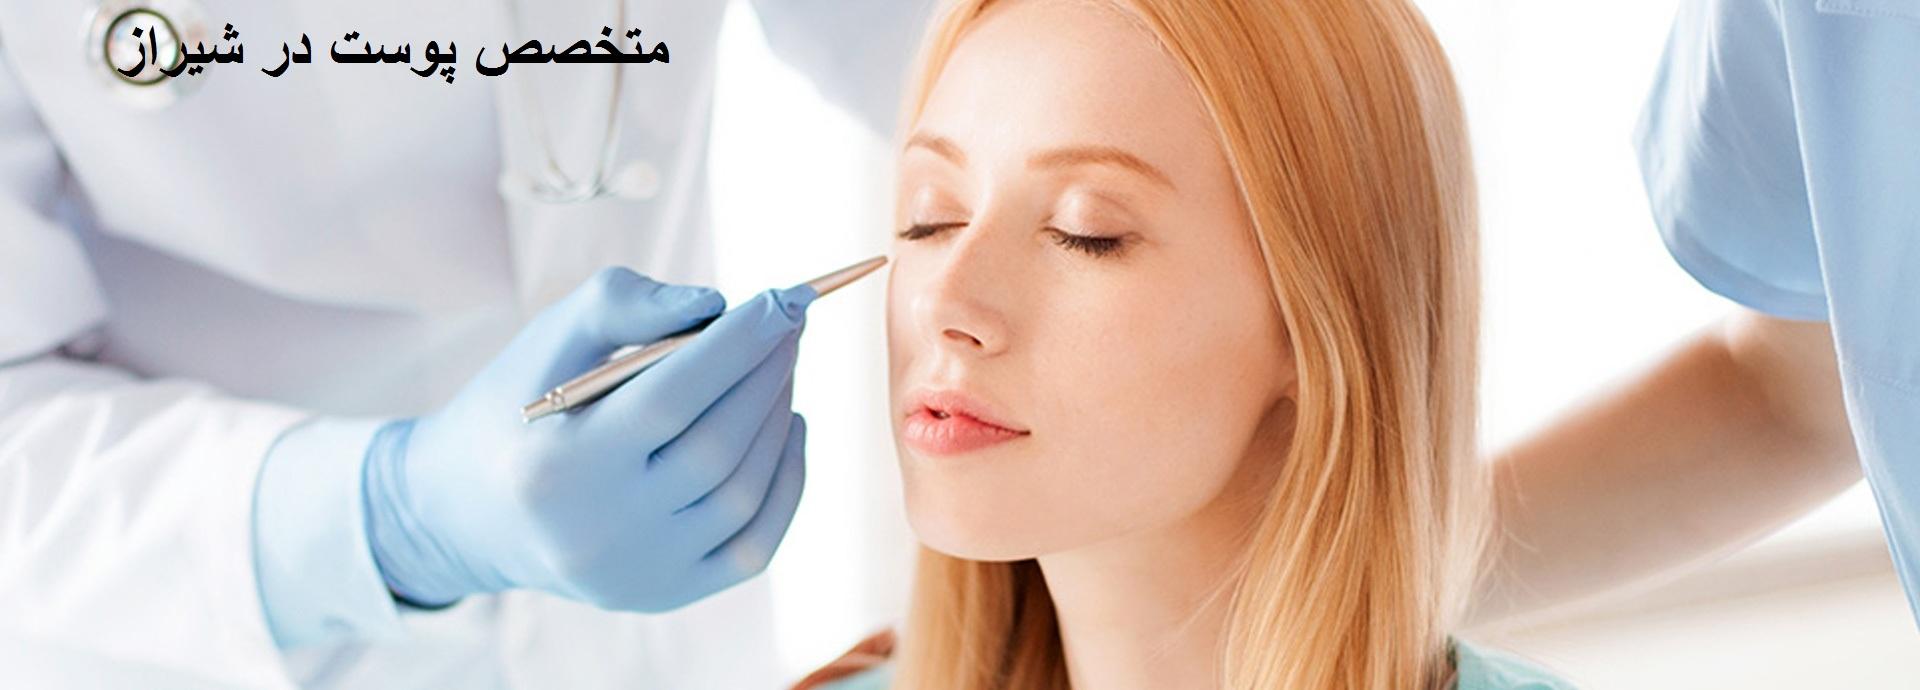 dermatology picture